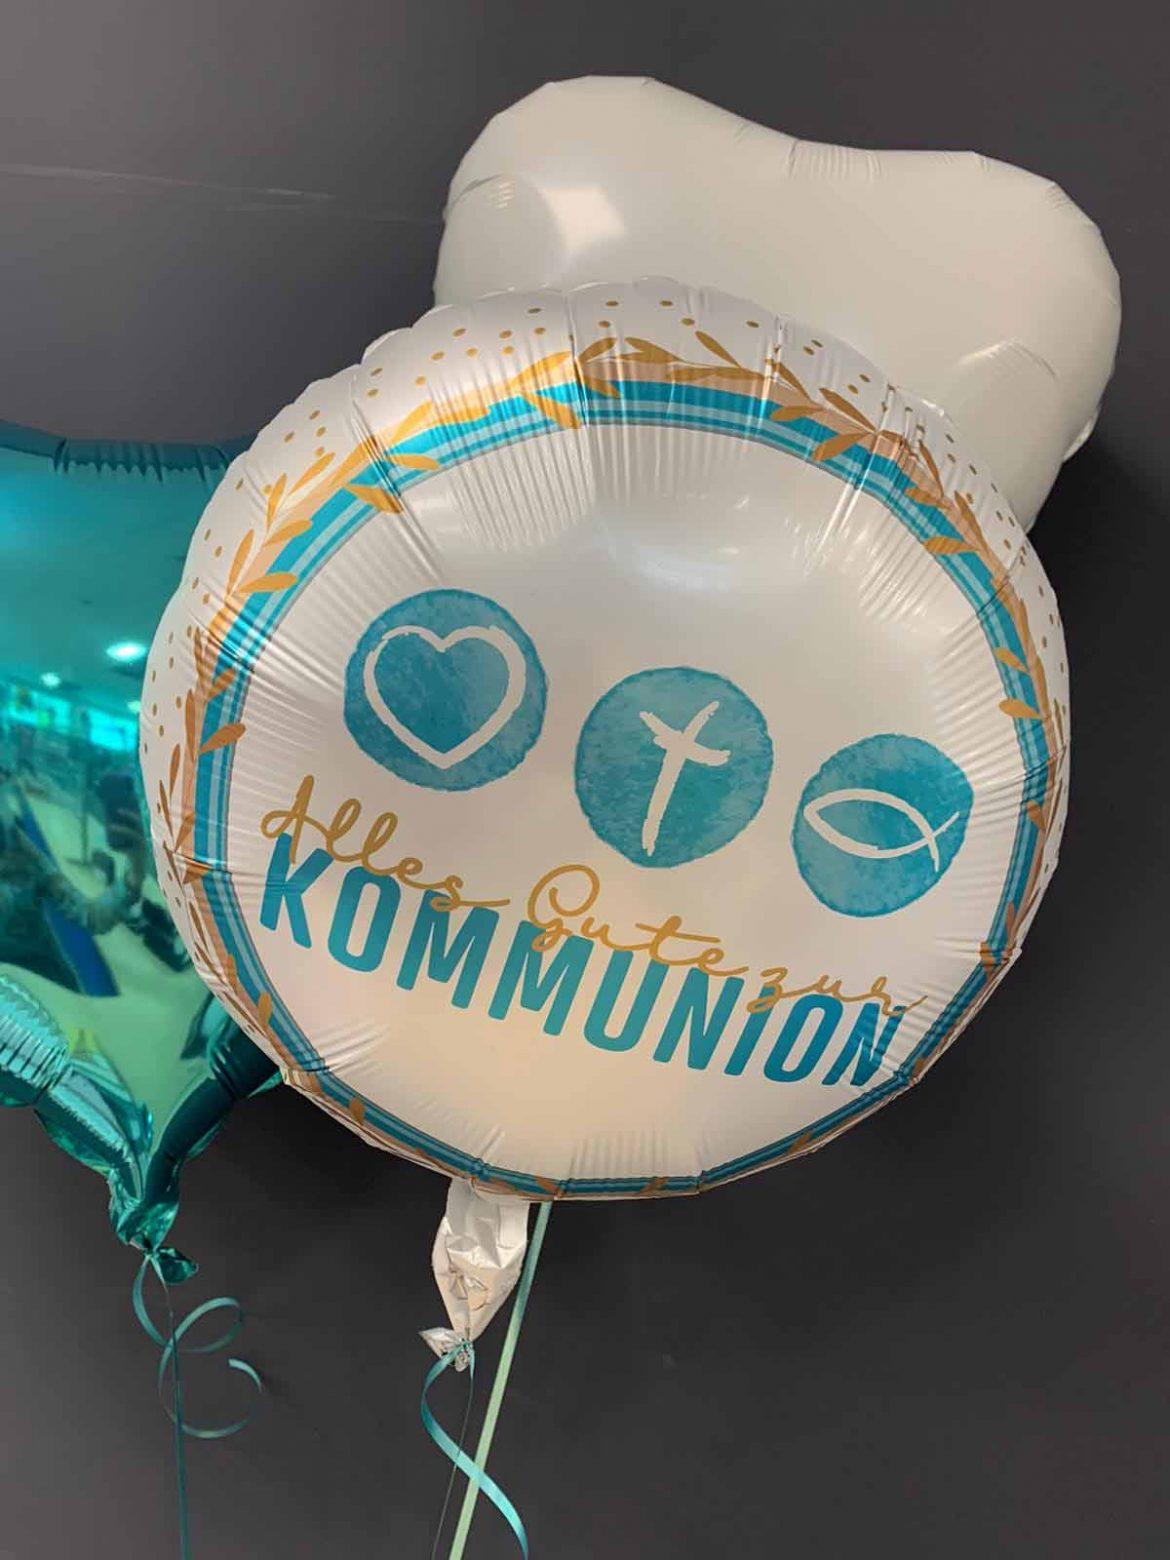 Kommunion Ballon € 5,90 <br>Dekoballons € 4,50 1